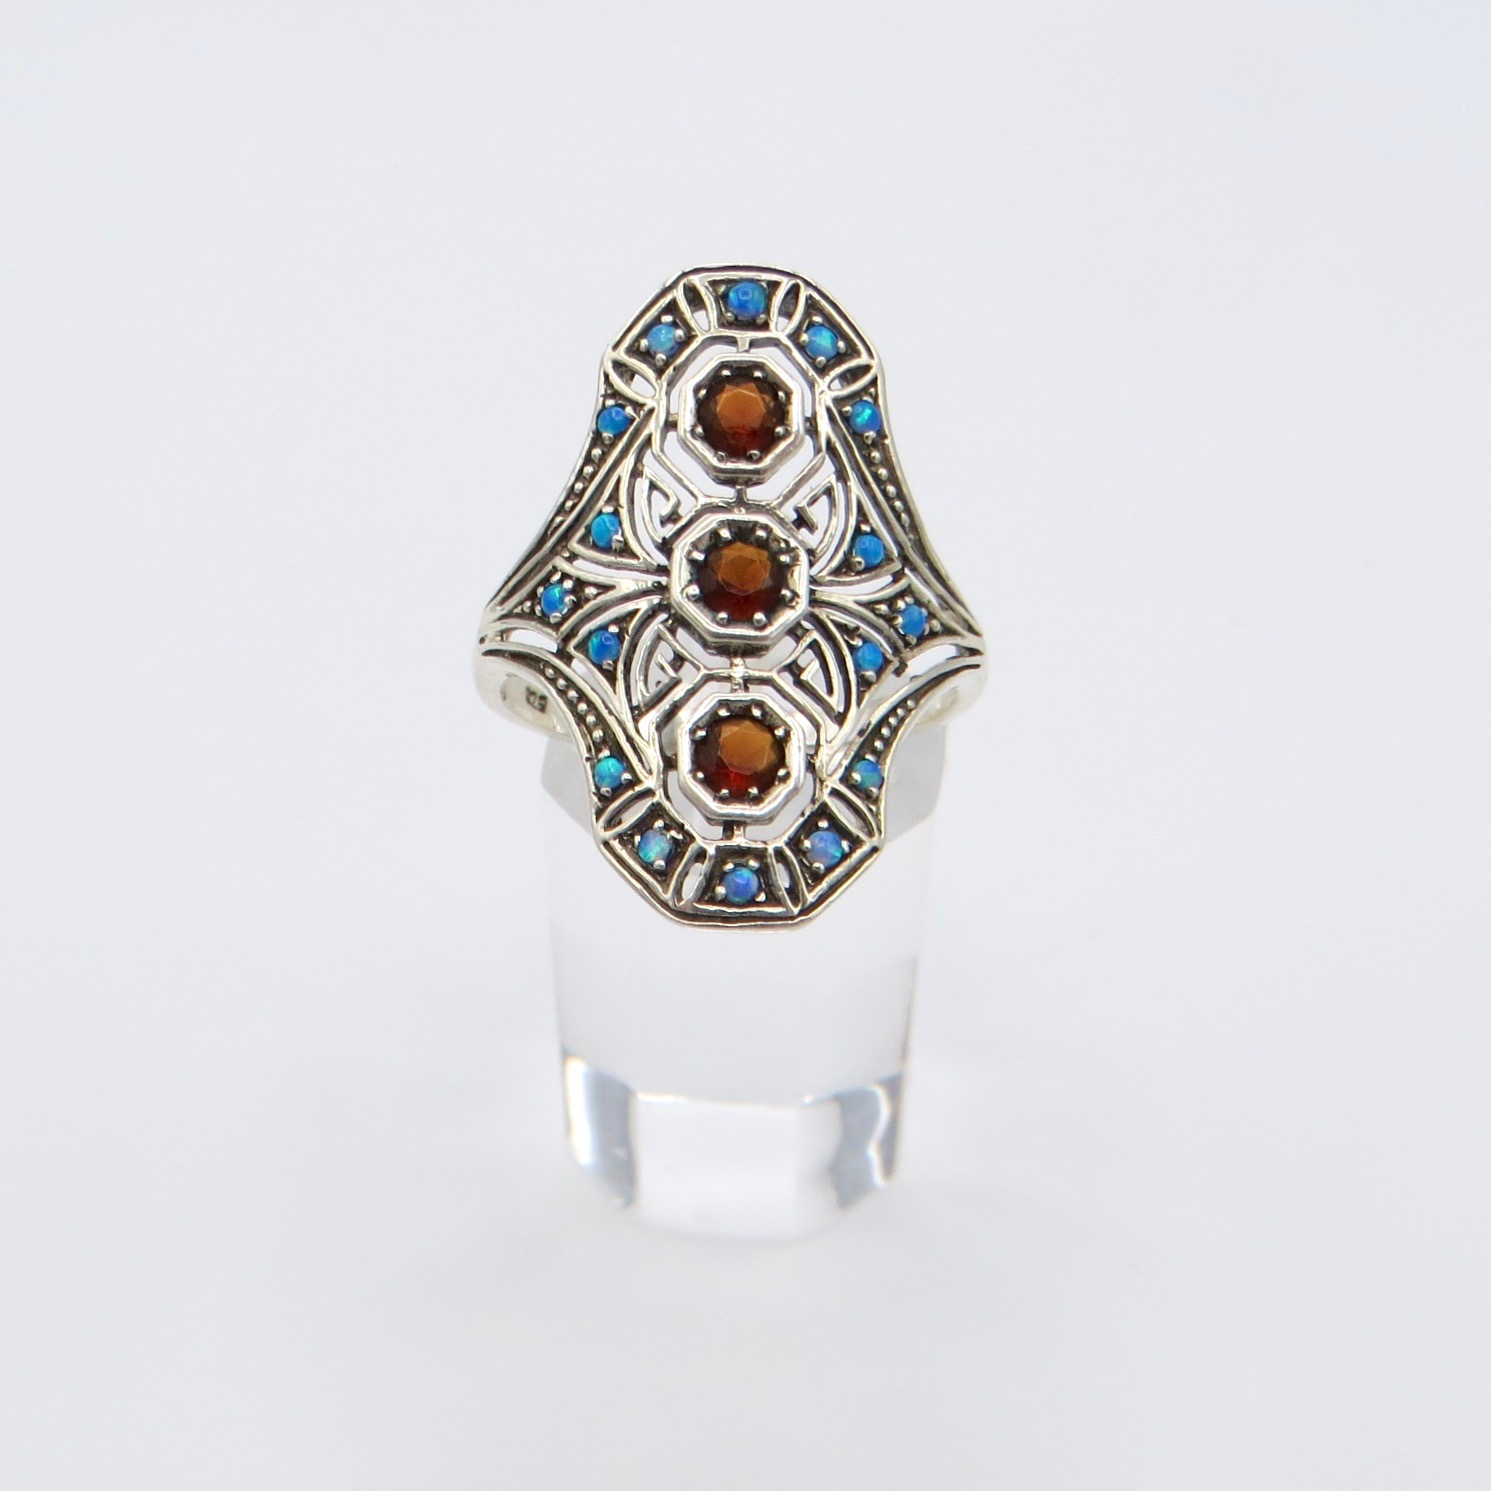 Silver, Garnet & Opal Filigree Ring